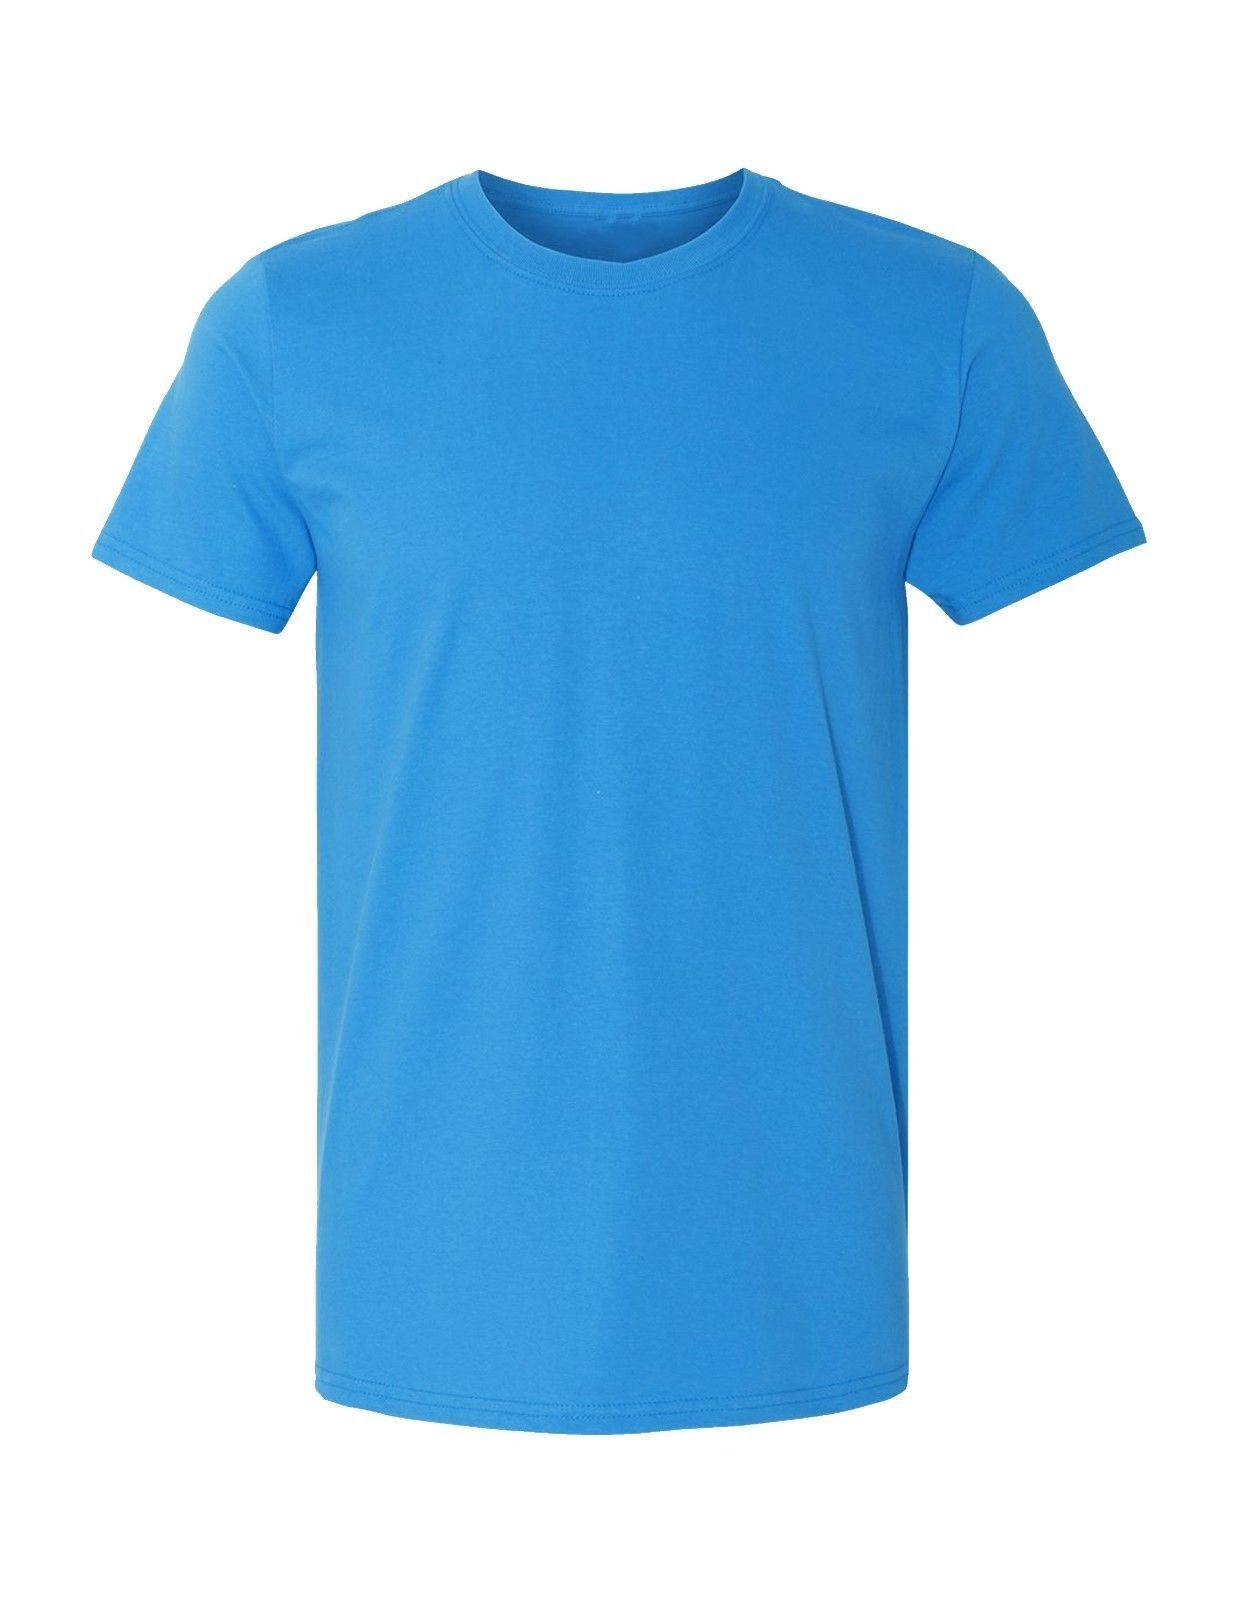 Download Xtrafly Apparel Men S Active Plain Basic Crewneck Short Sleeve T Shirt Blue Shirts Tee Shirt Print T Shirt